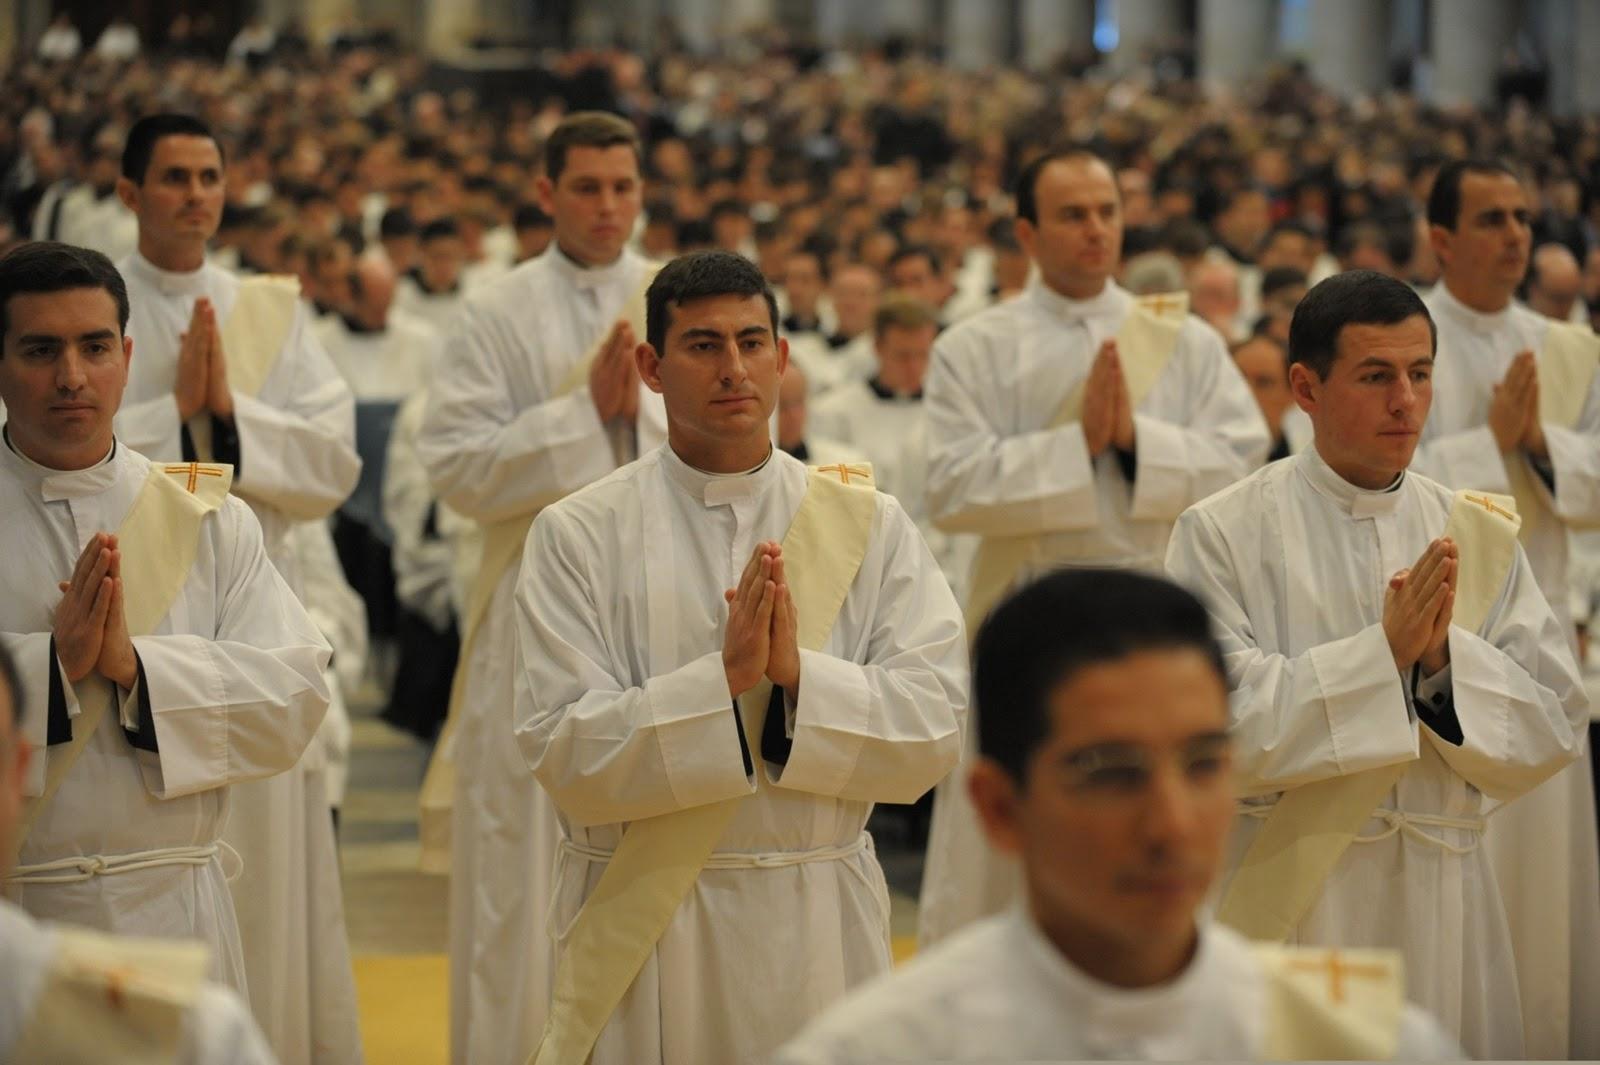 Foto sacerdotes en aceite